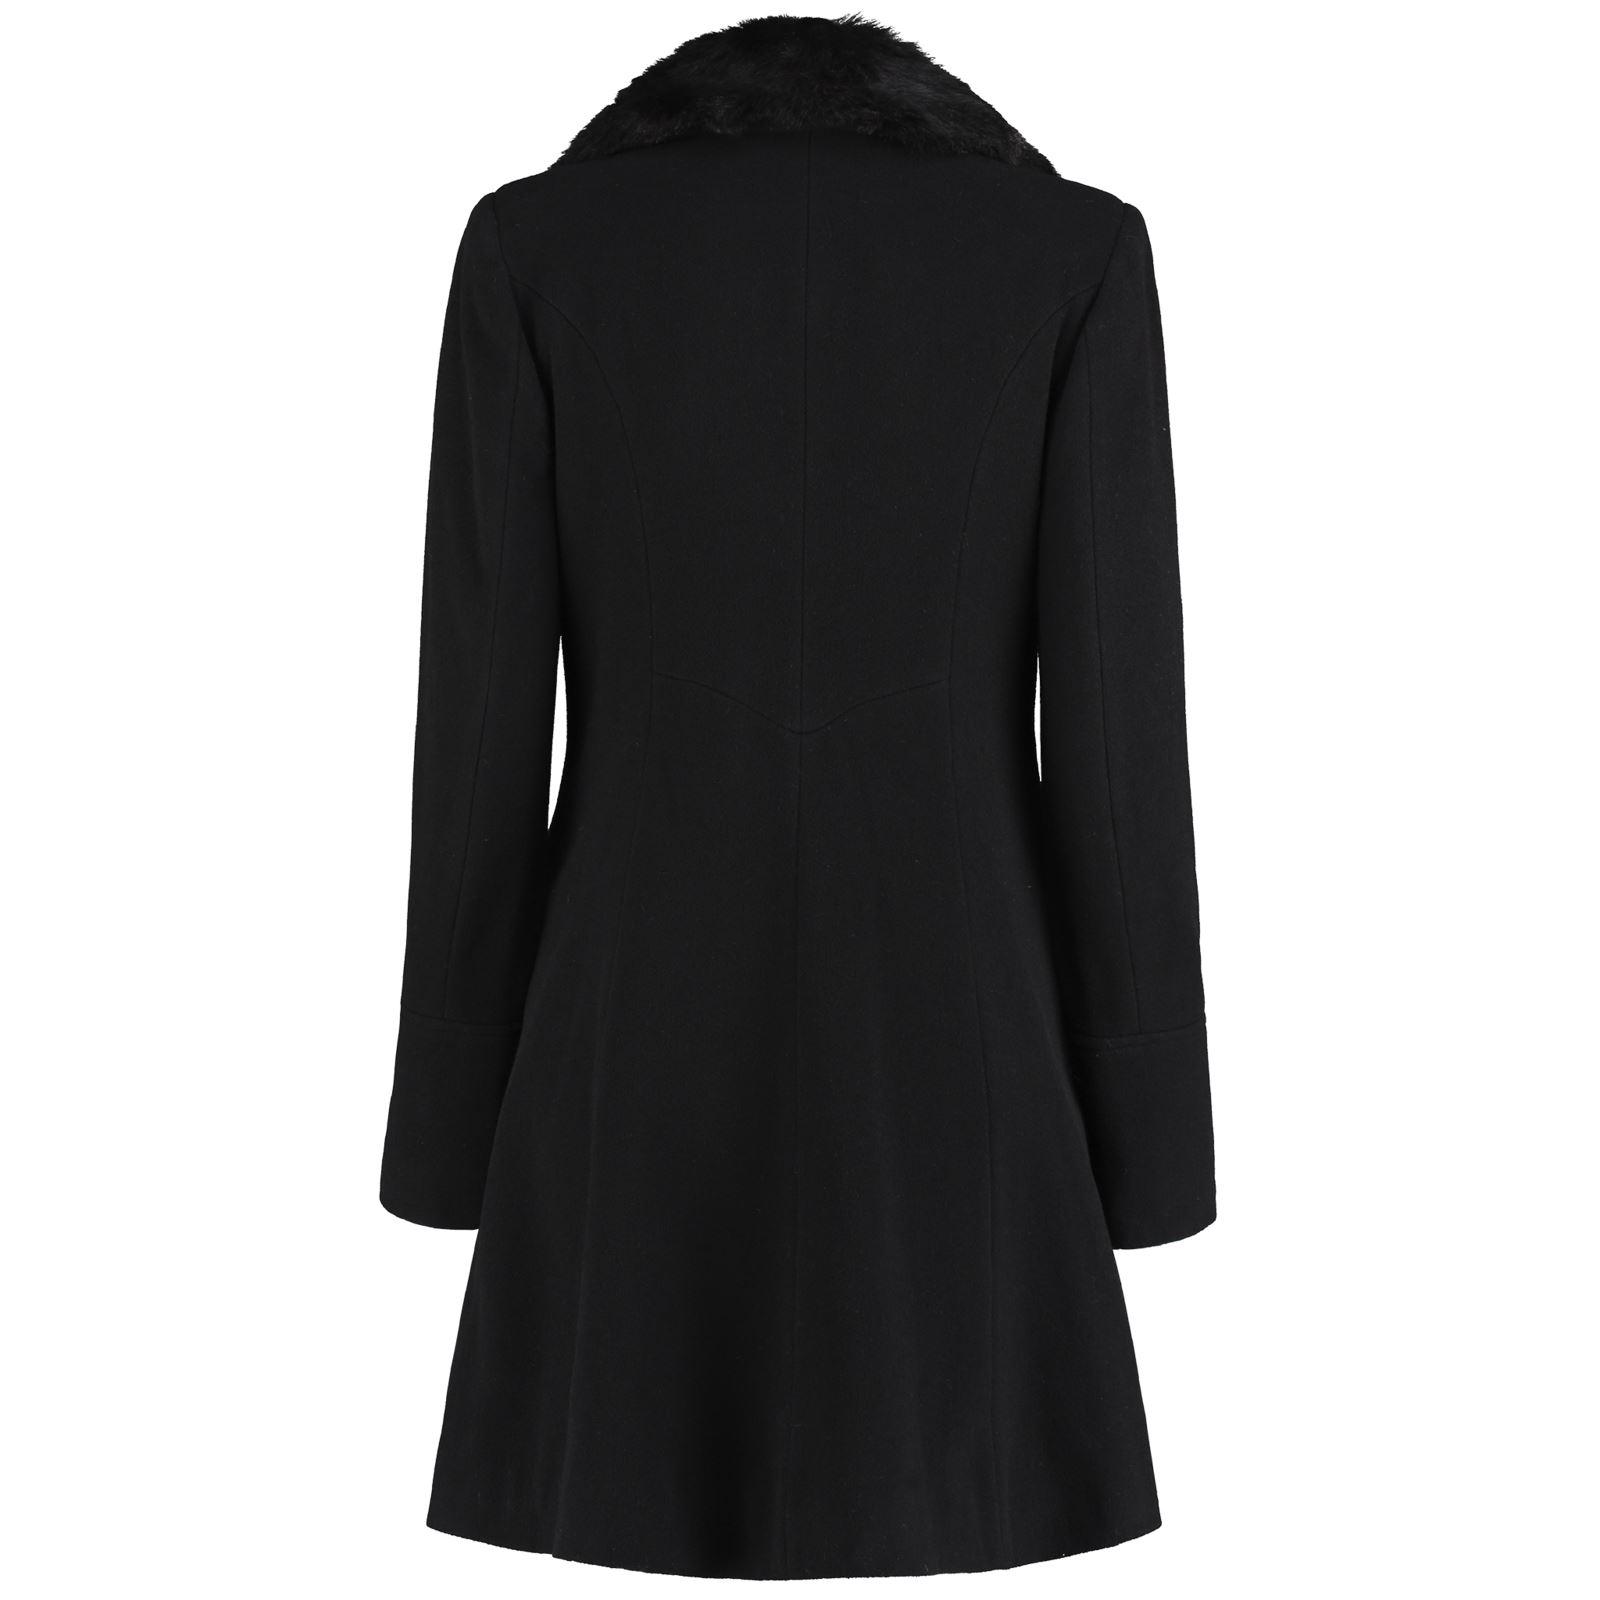 De-La-Creme-Womens-Wool-Blend-Faux-Fur-Collar-Midi-Coat thumbnail 6